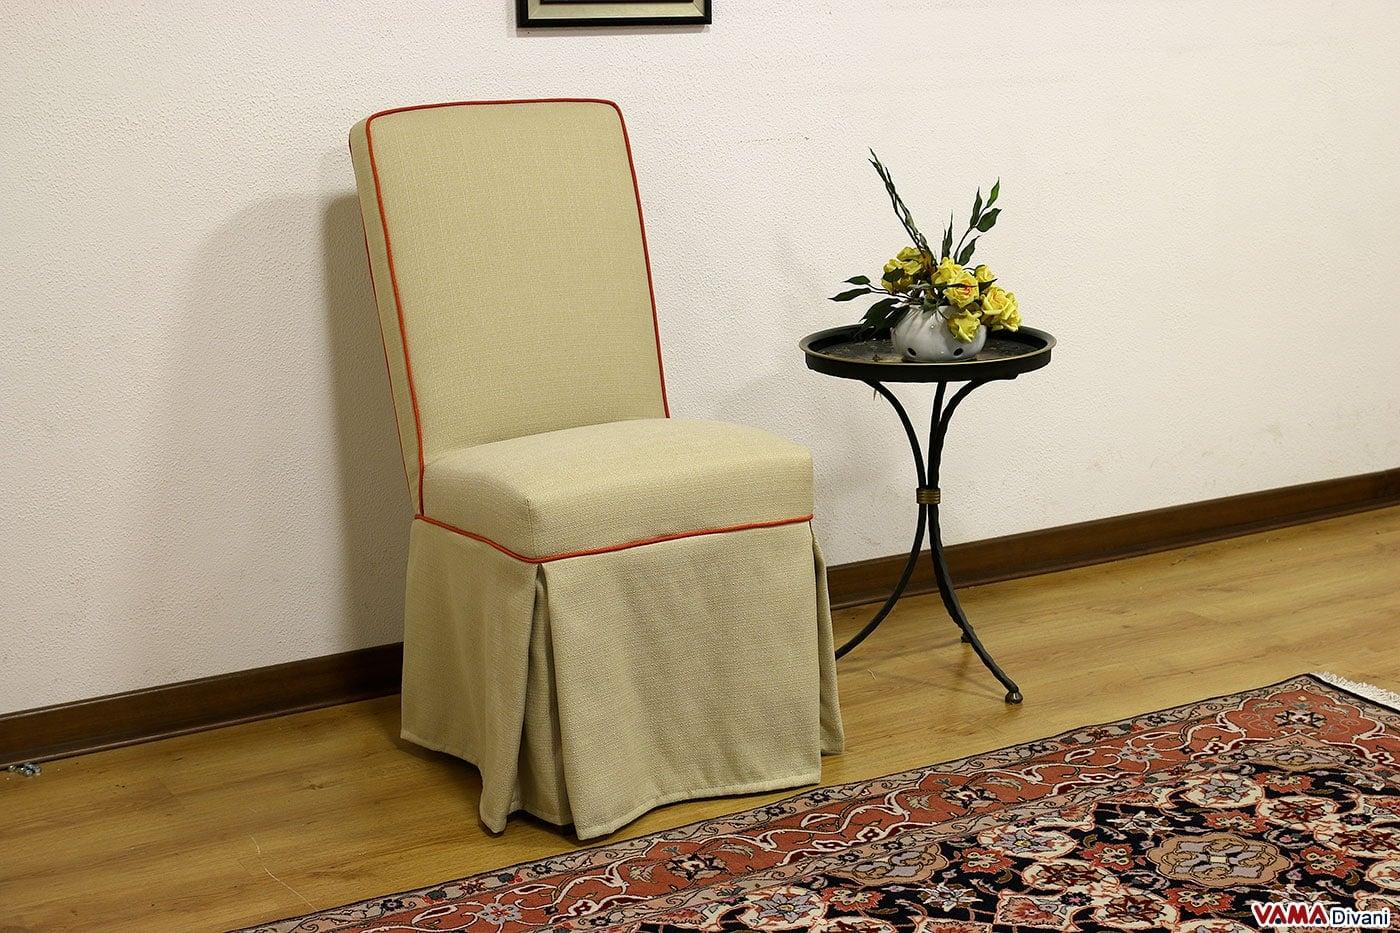 Sedia silvia vama divani for Sala da pranzo offerta